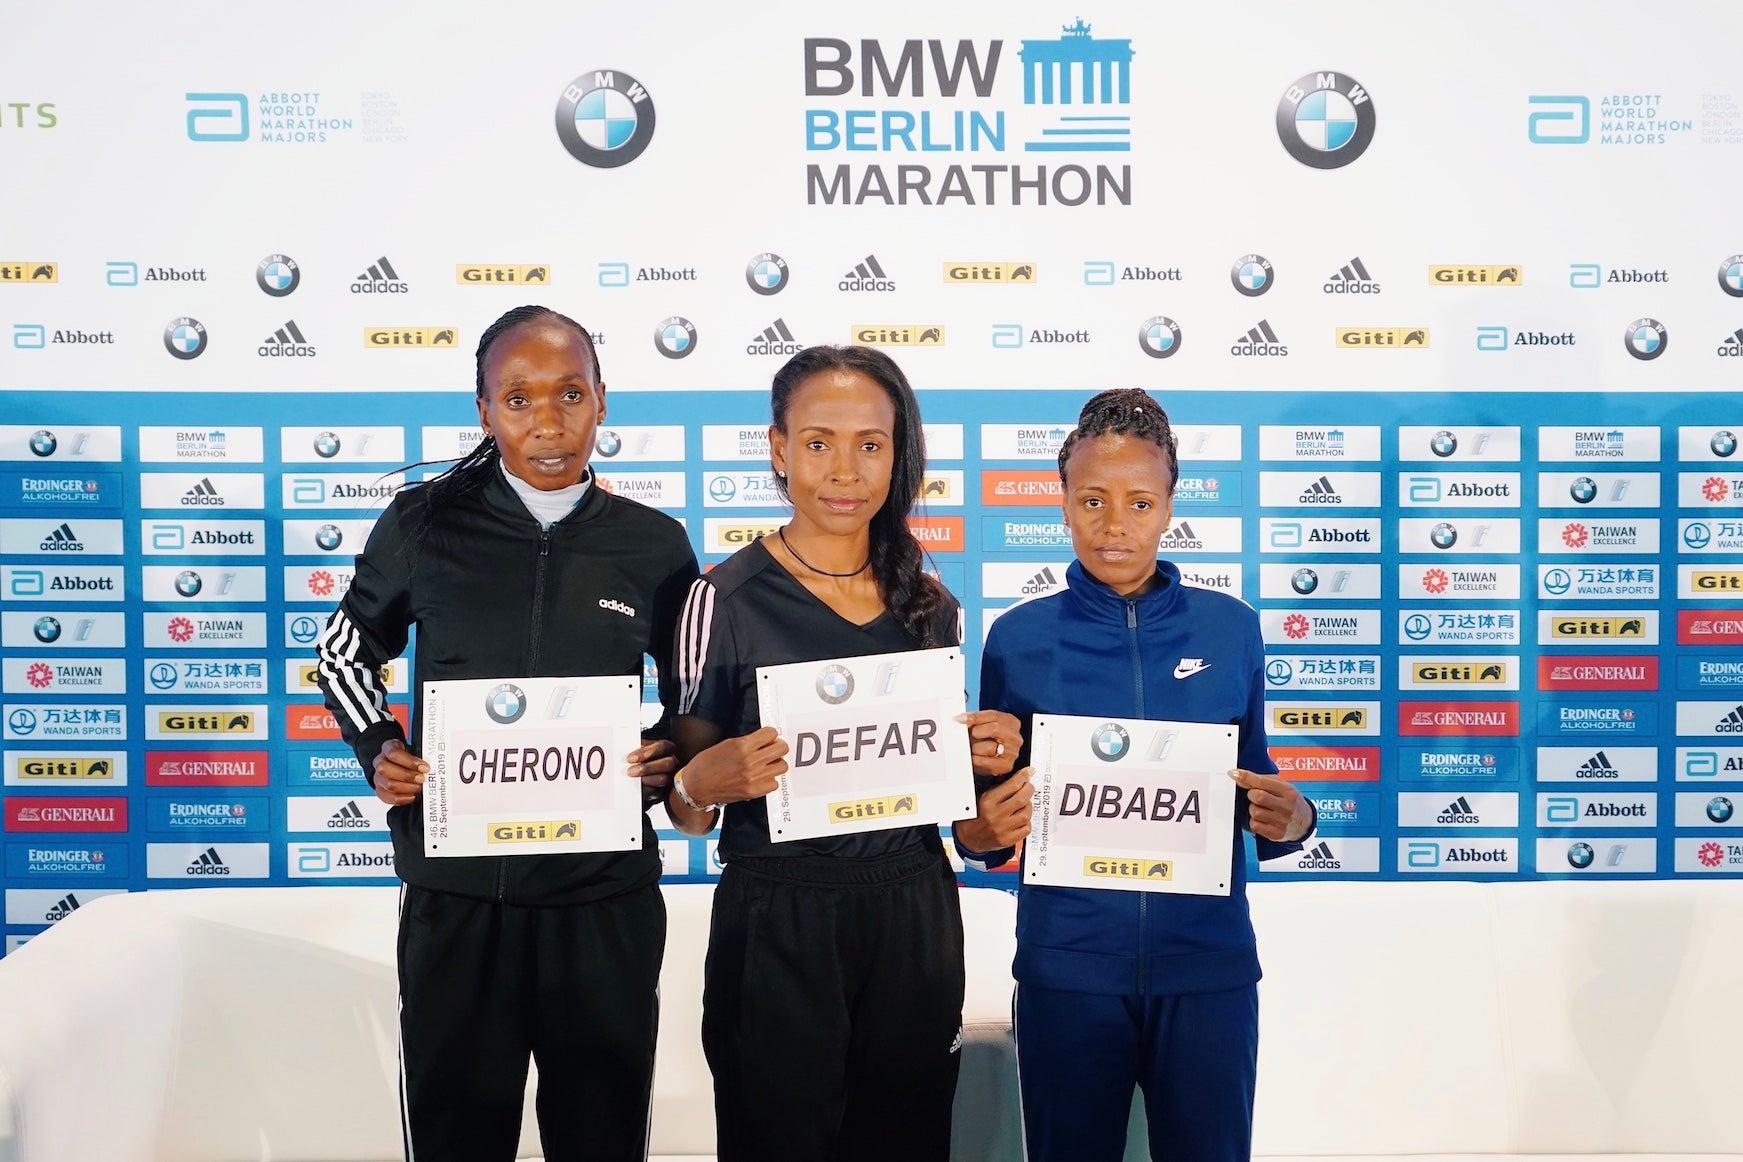 2019 BMW Berlin Marathon Press Conference